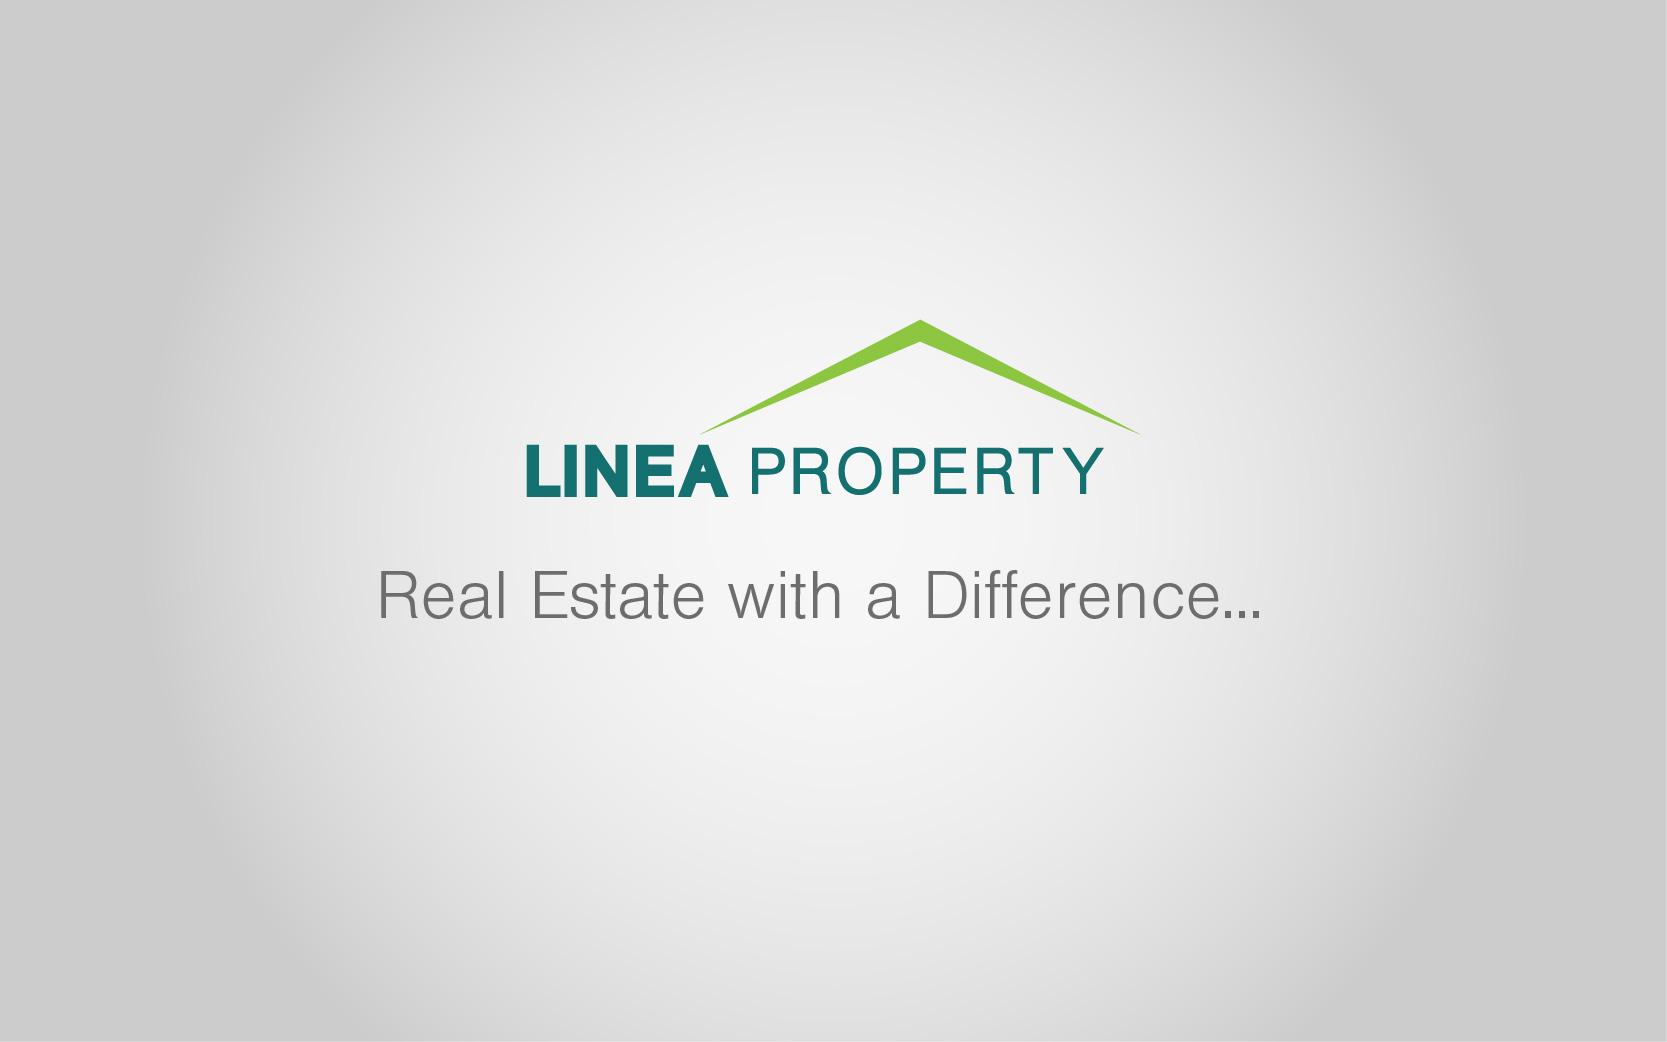 Linea Property